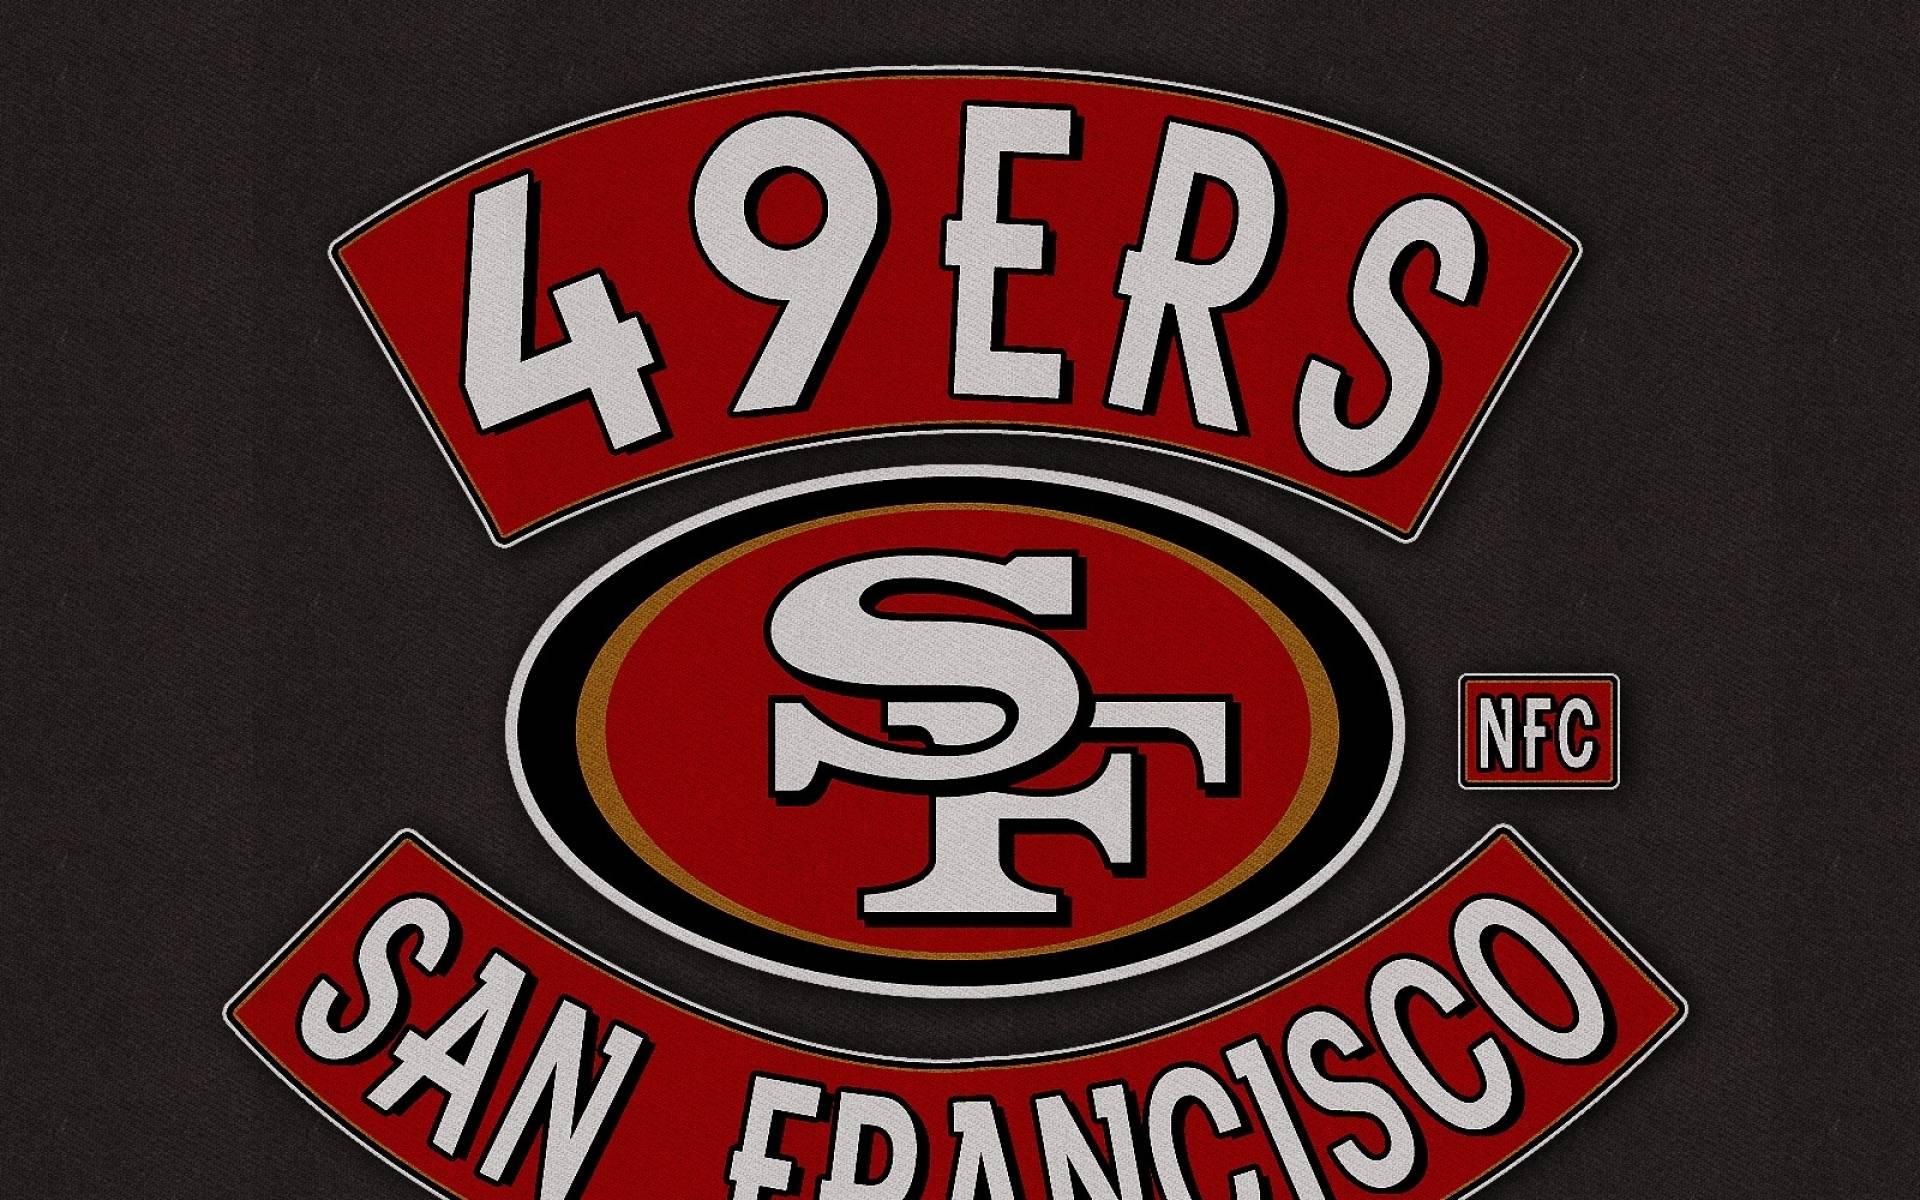 San Francisco 49ers Wallpapers 2015 1920x1200